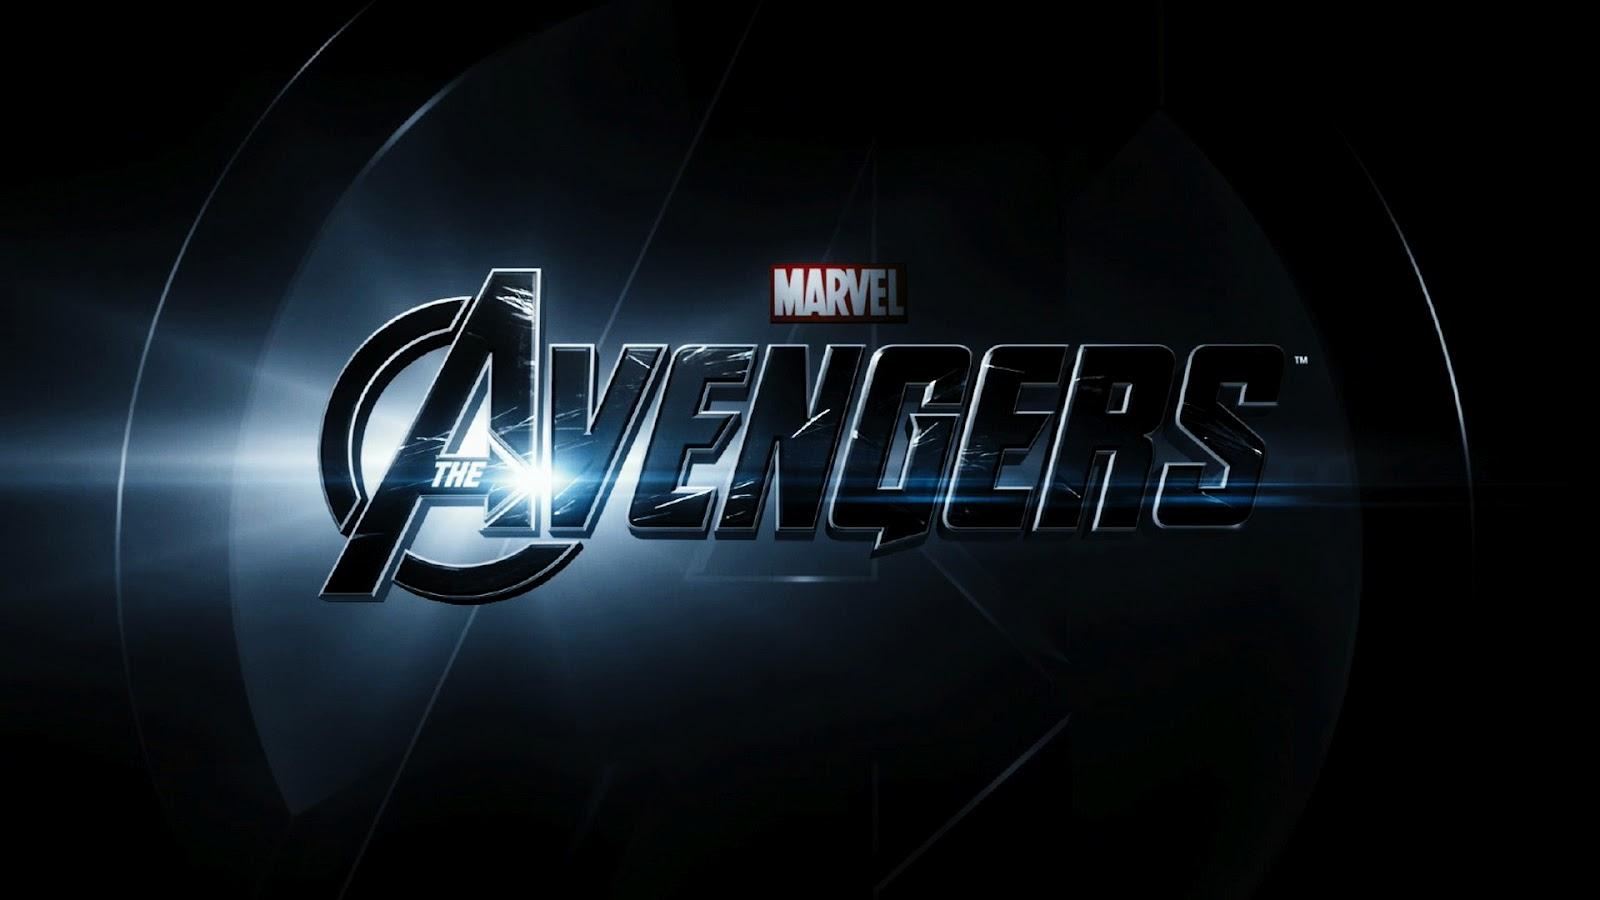 Wallpapers   HD Desktop Wallpapers Online The Avengers 1600x900